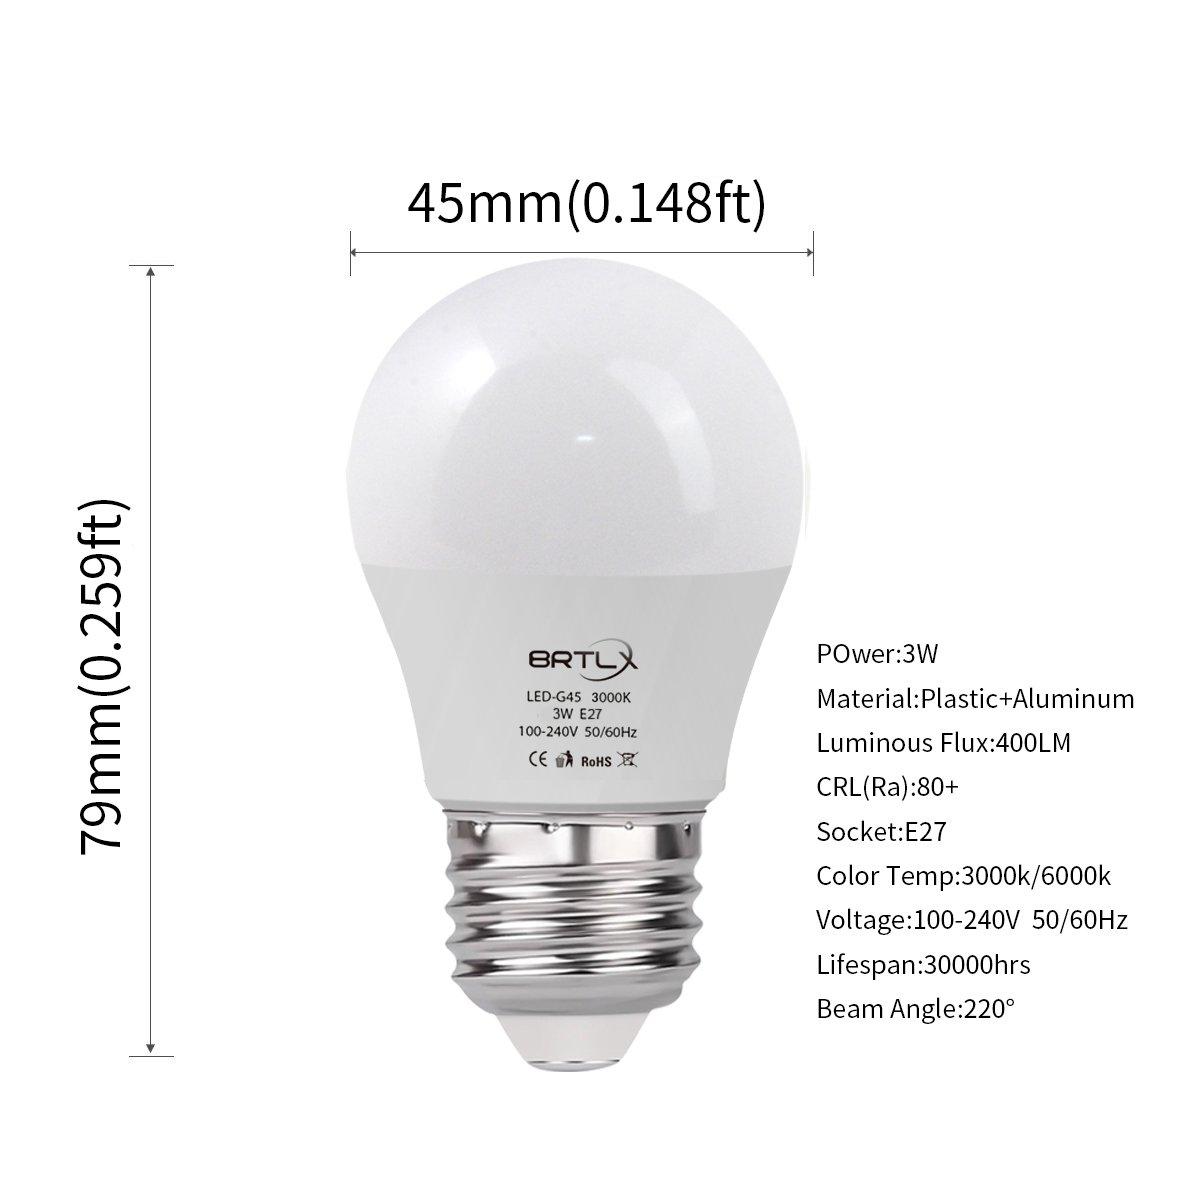 Bombilla LED Esférica E27 3 W, Equivalencia de 25 W, Blanco Cálido 3000K, 240 Lúmenes, No Regulable, Pack de 4 Unidades: Amazon.es: Iluminación